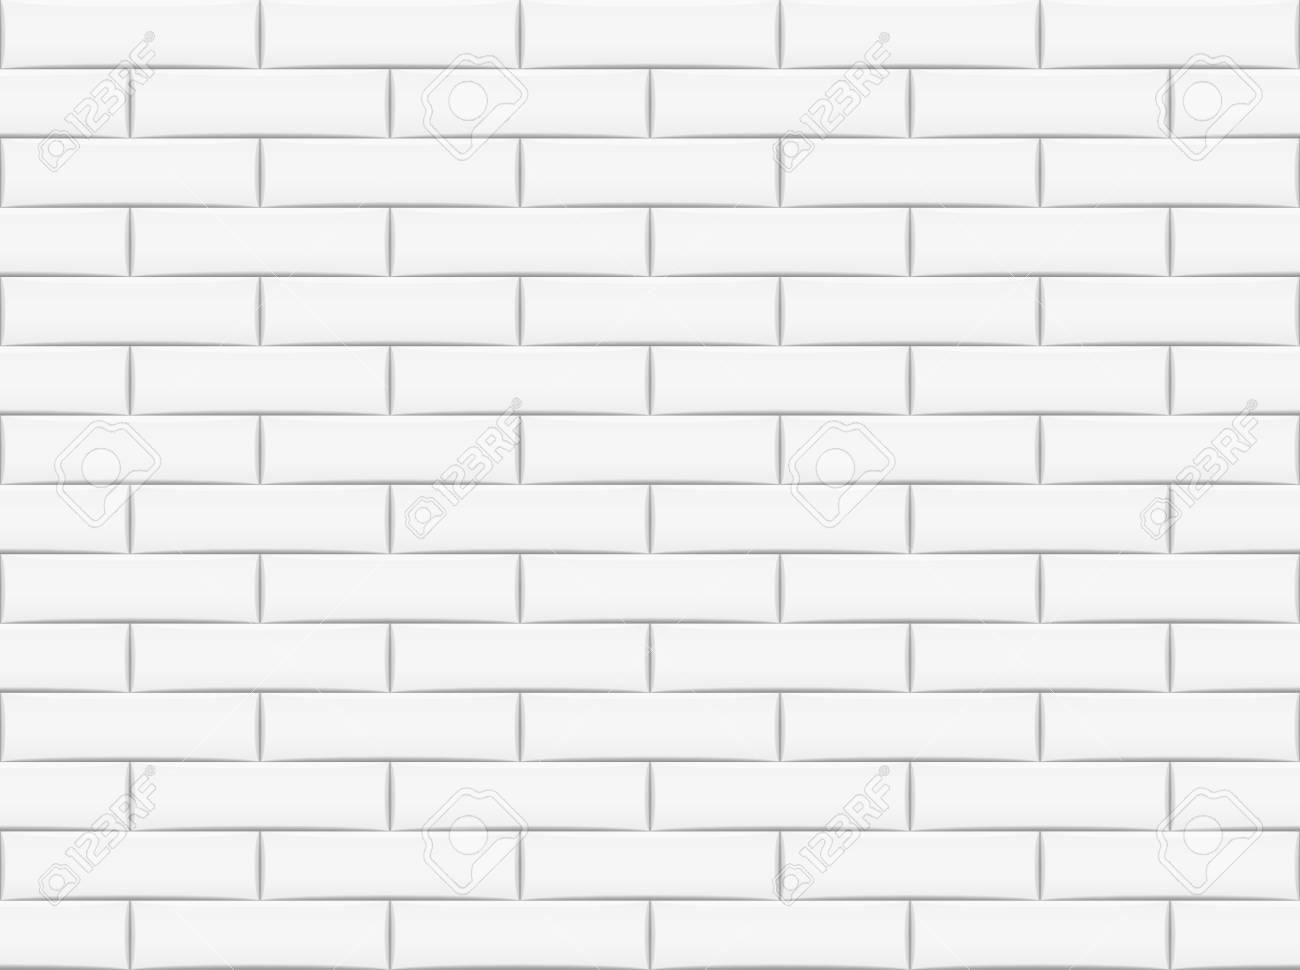 Ceramic brick tile wall. Vector illustration. Eps 10. - 90924094